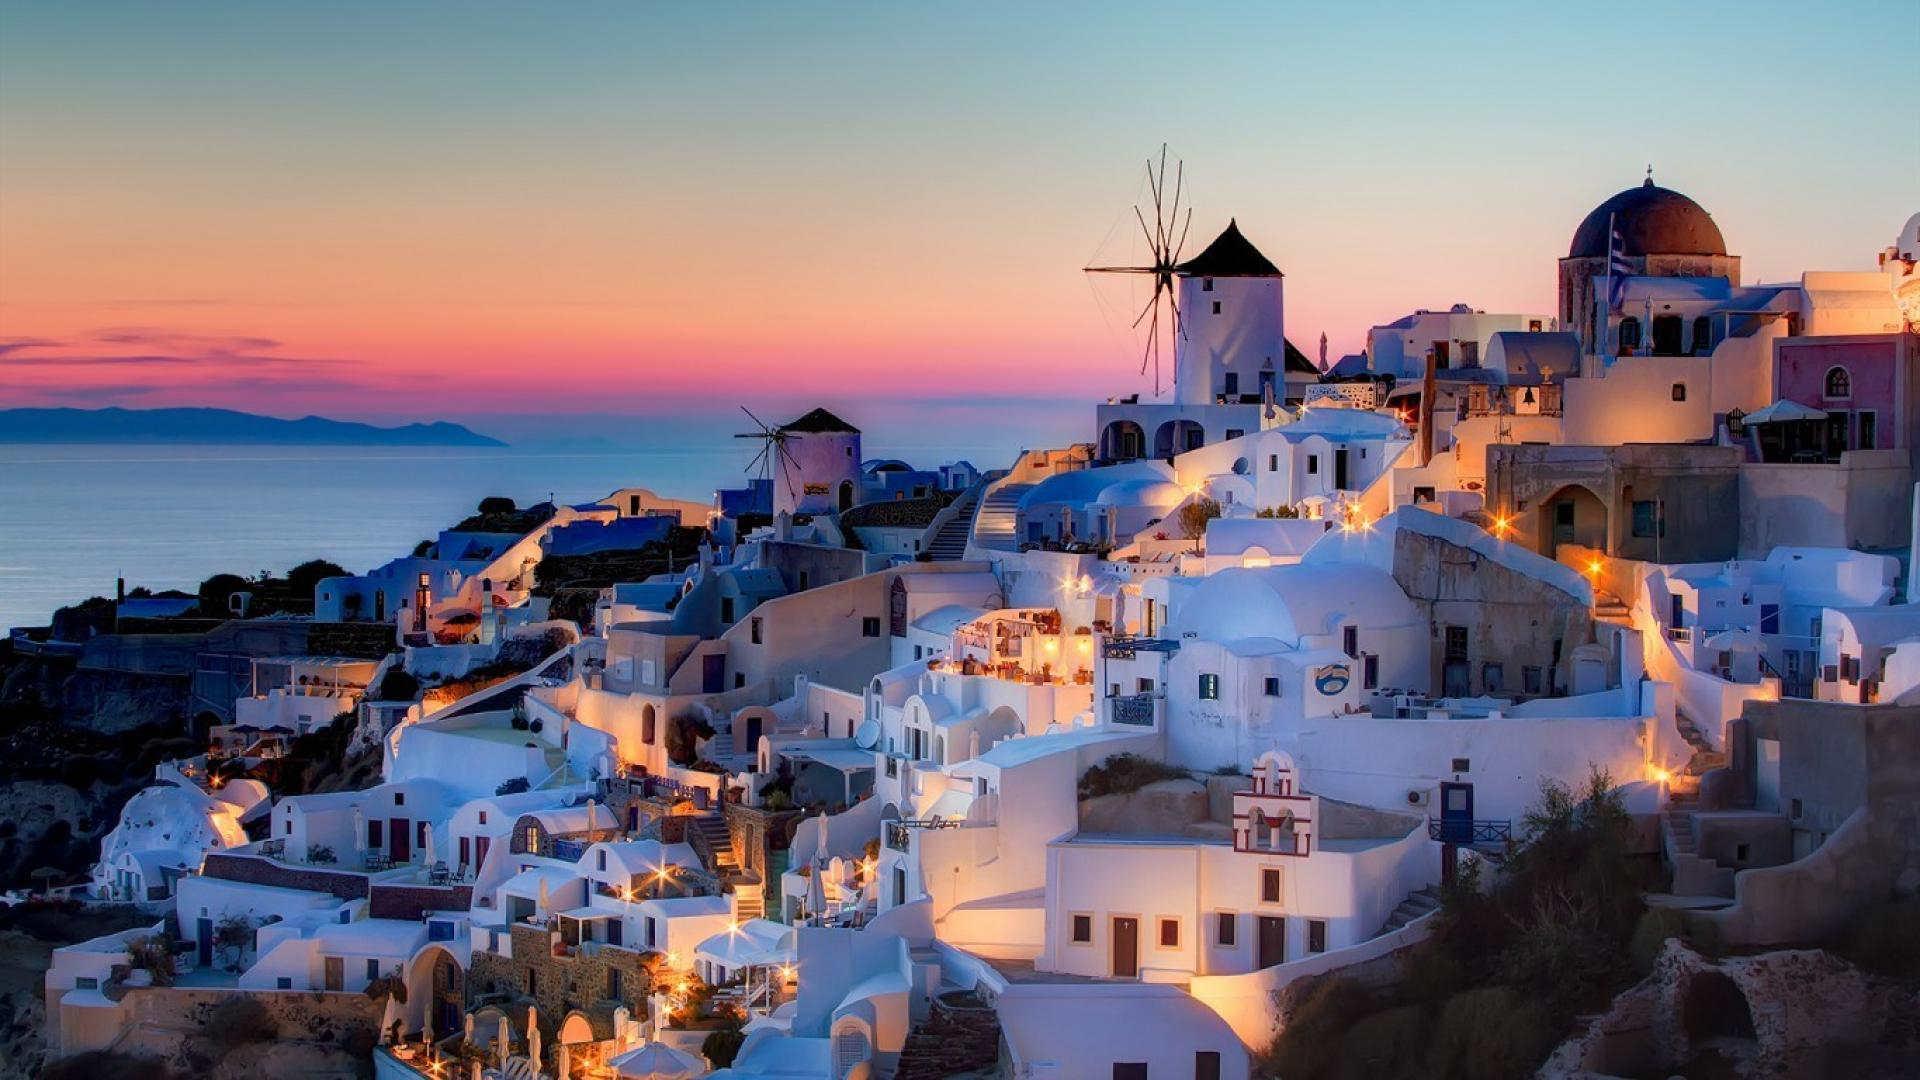 santorini-greece-wallpapers-